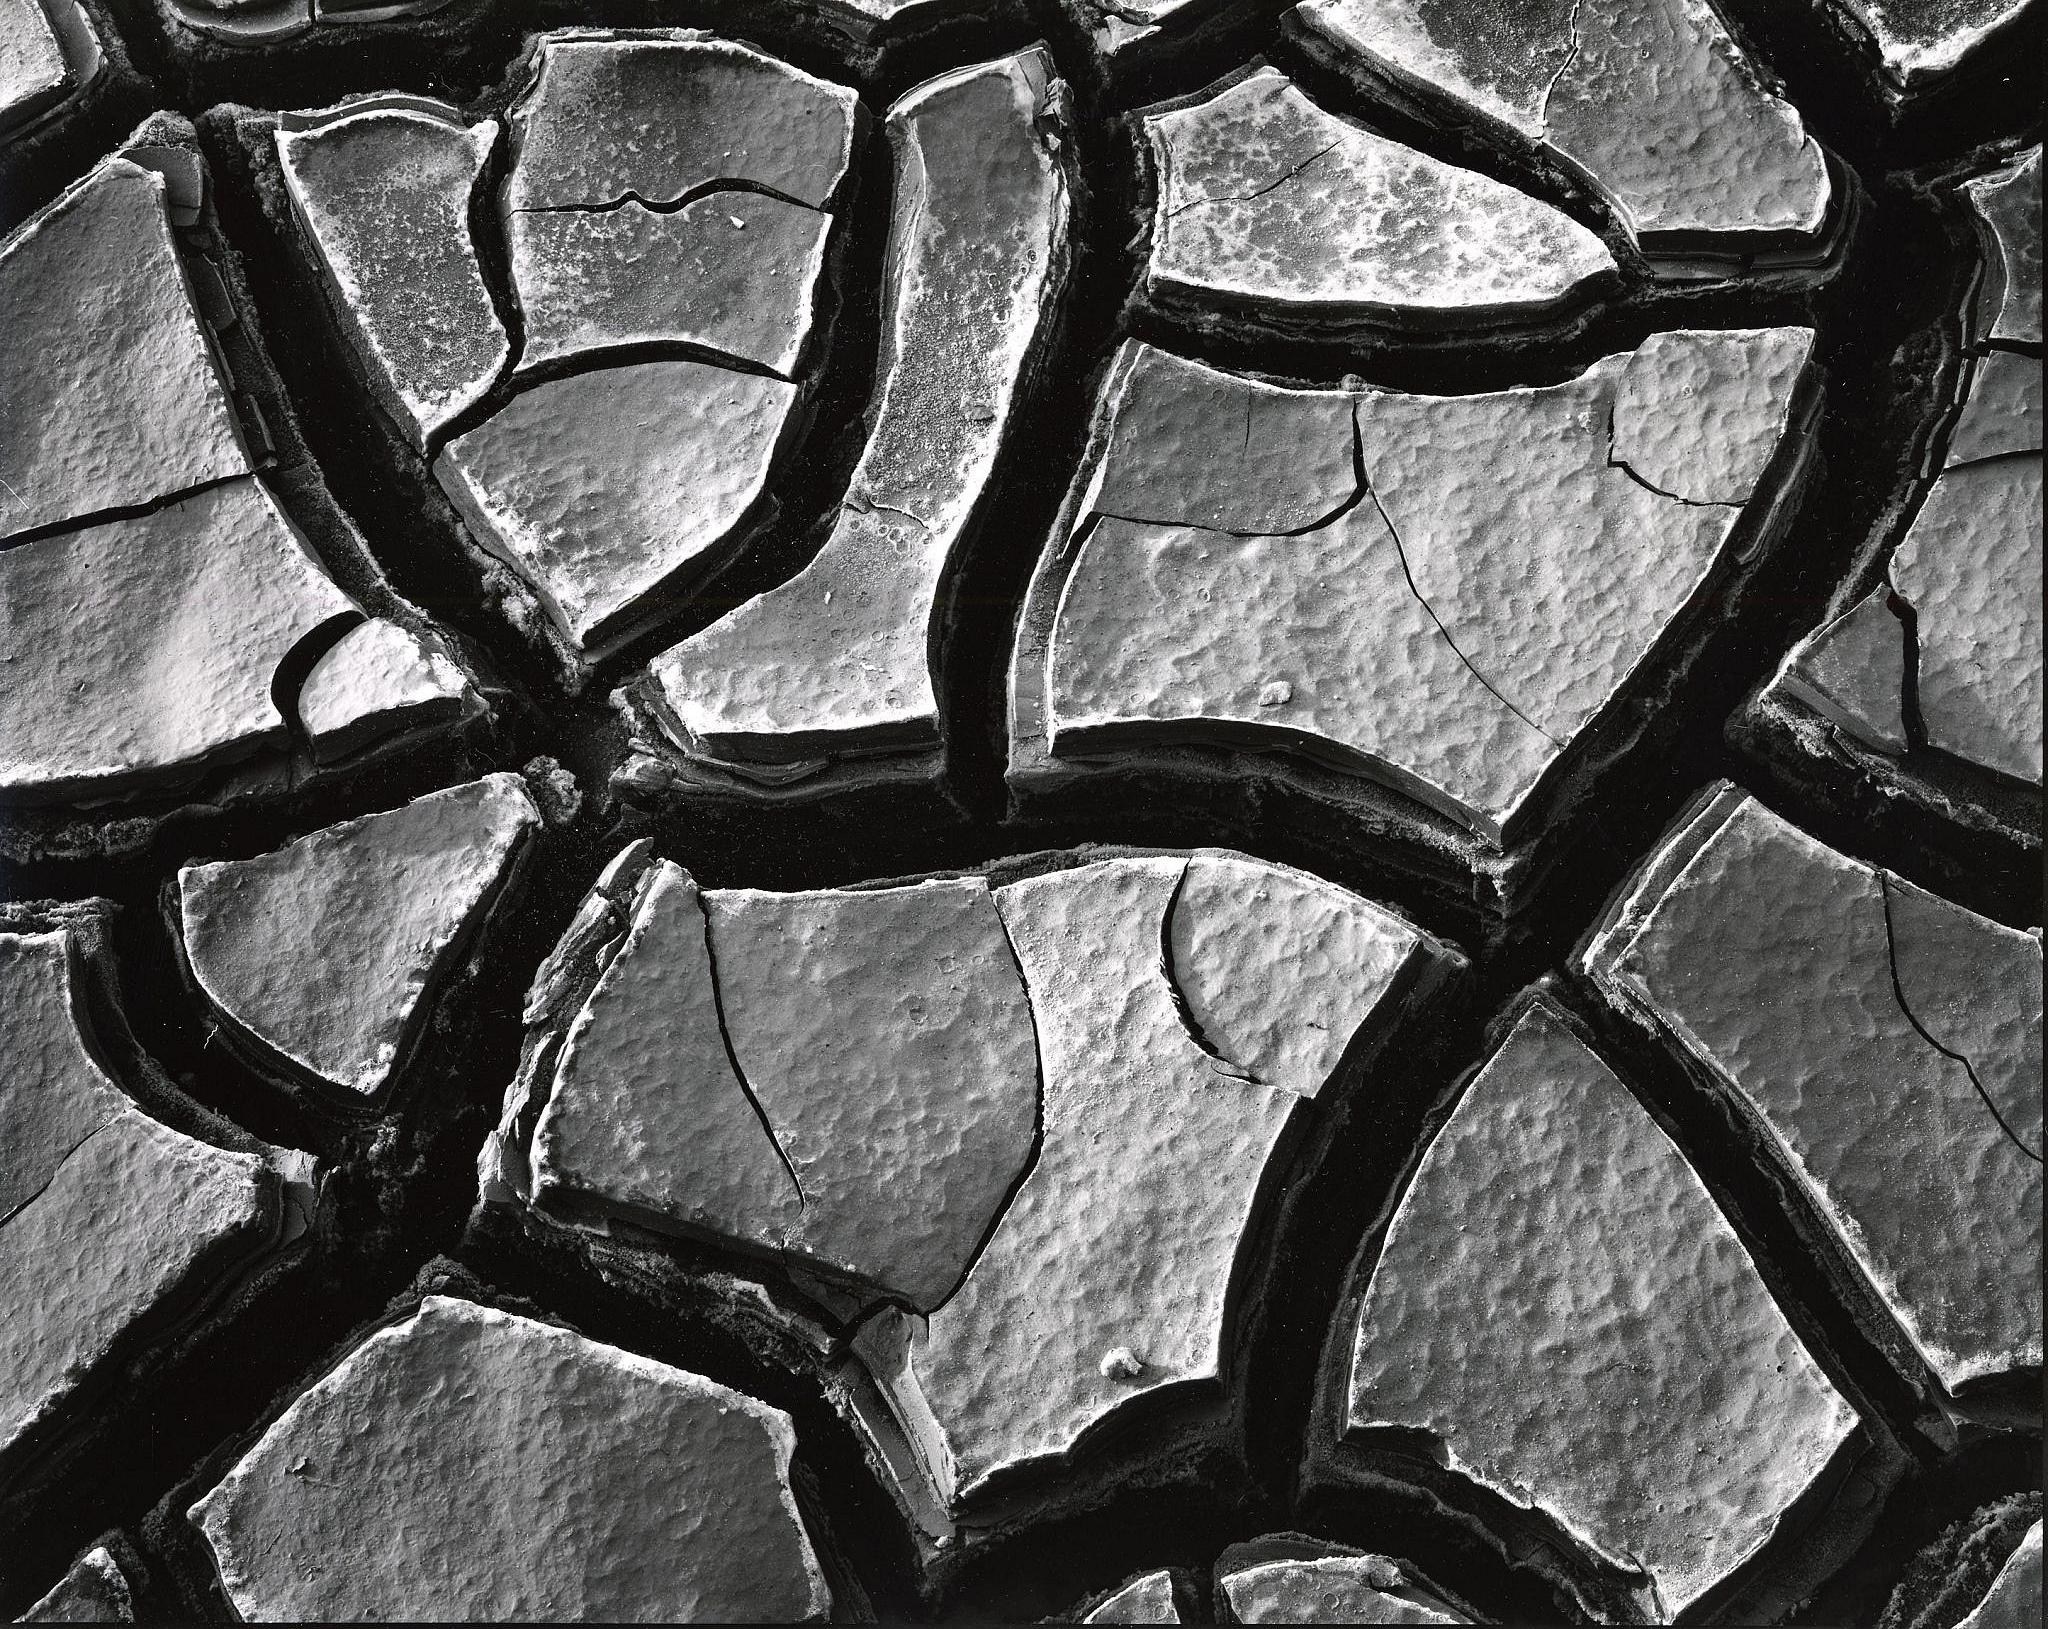 Brett-Weston-Mud-Cracks.jpg